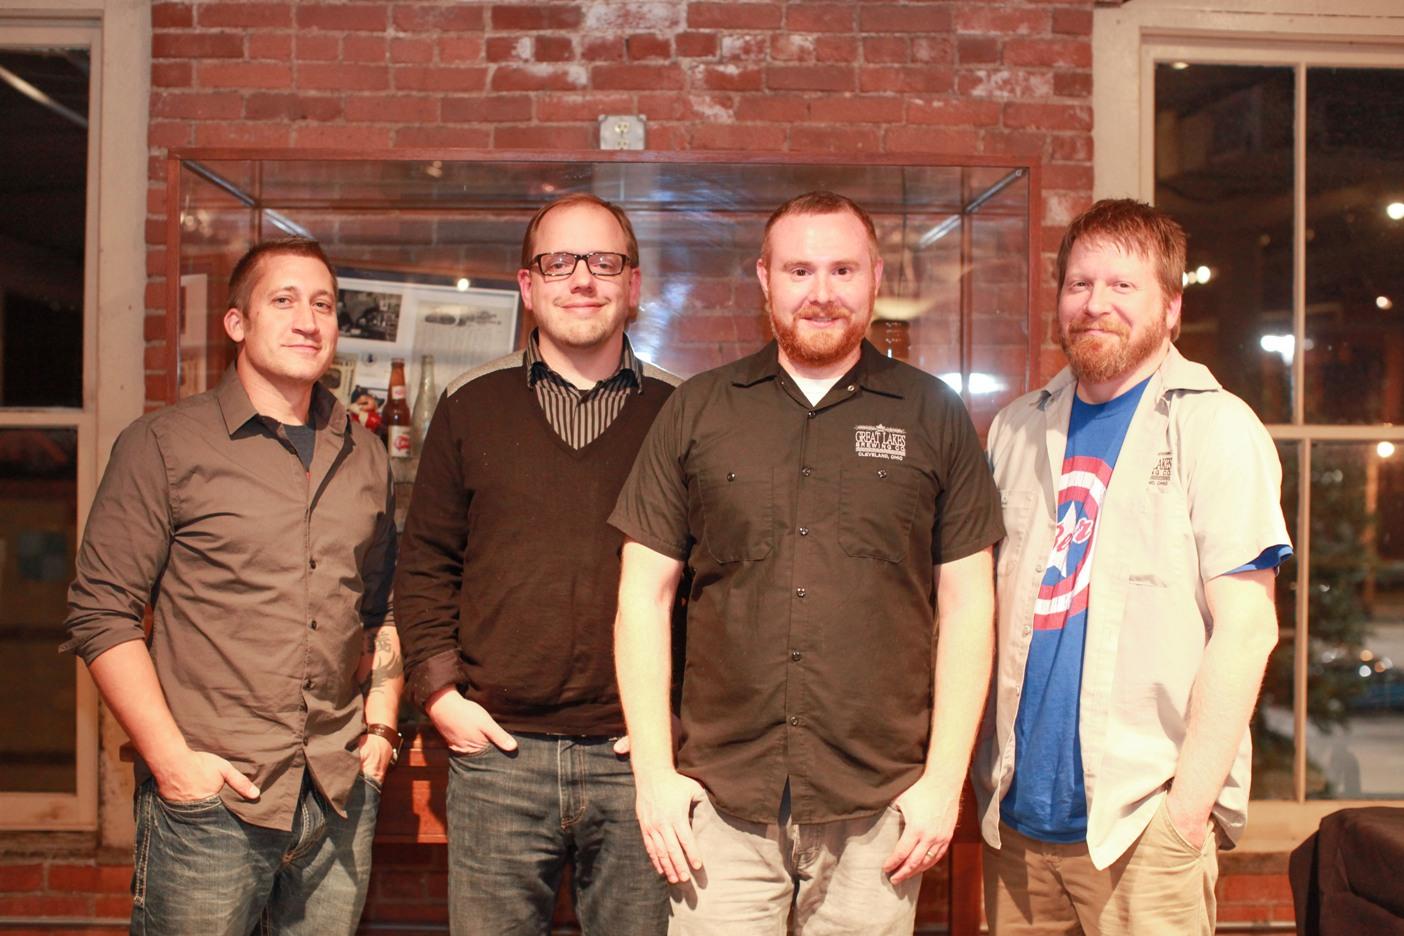 John Dudas, Brad Ricaa, Joel Warger and Jefferson West